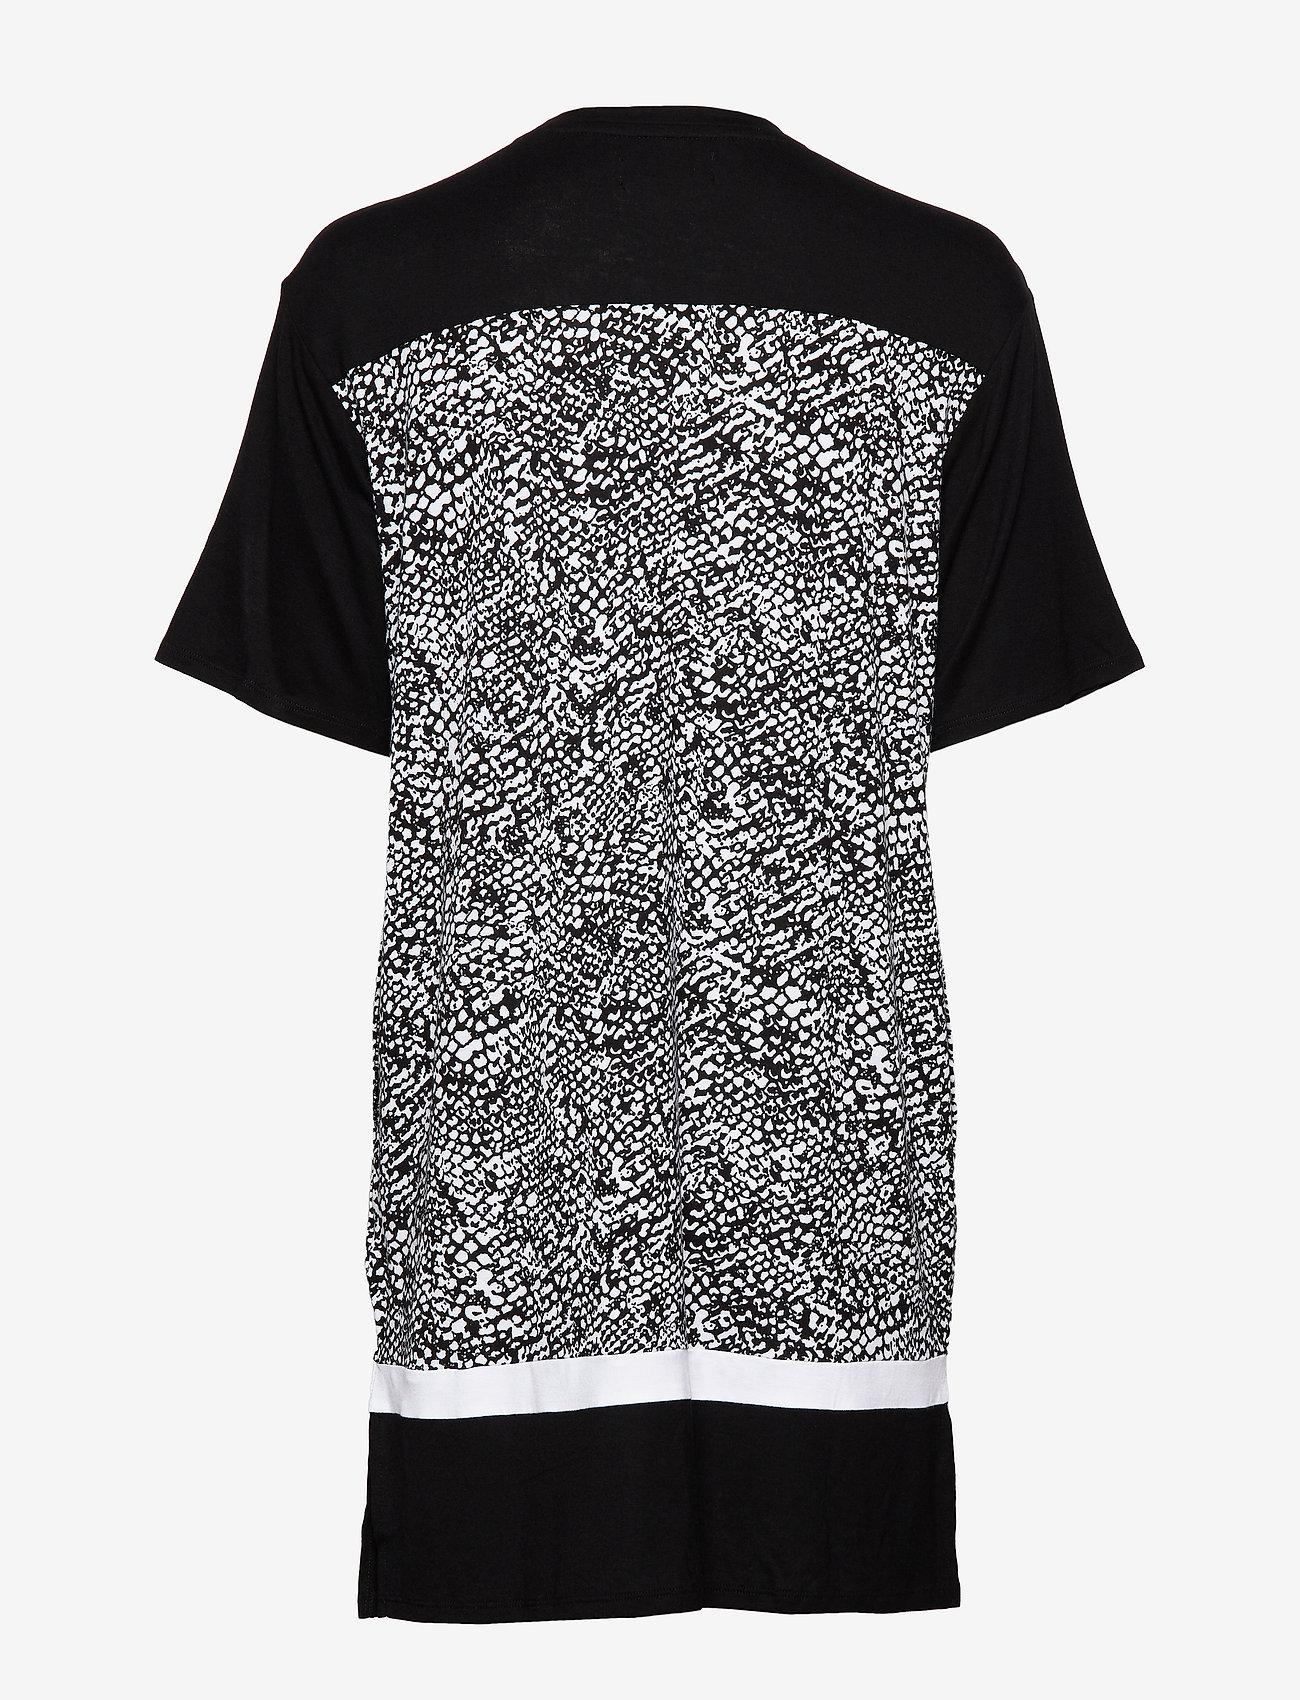 Dkny Shadow Play Sleepshirt S. Sl. (Black Snake) - DKNY Homewear ZwcBQJ